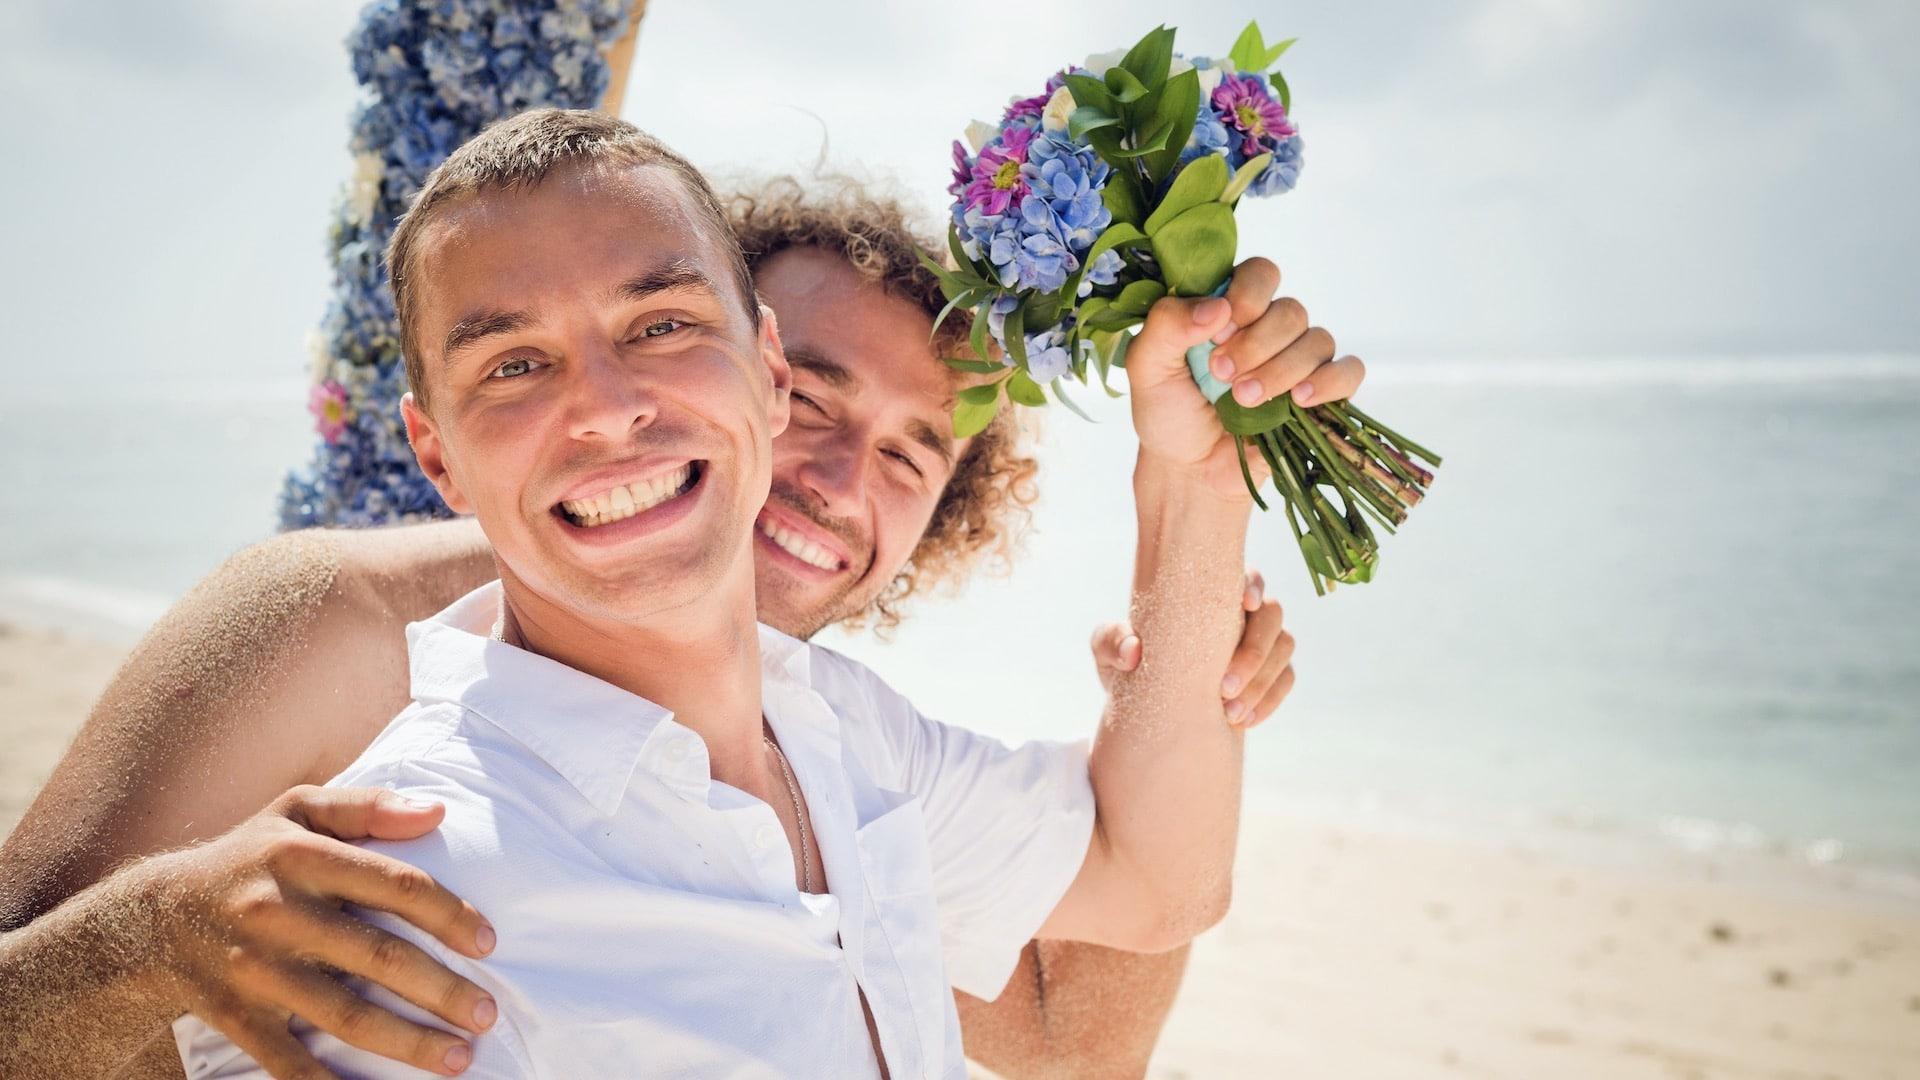 Gay Wedding Abroad - Gay couple on beach